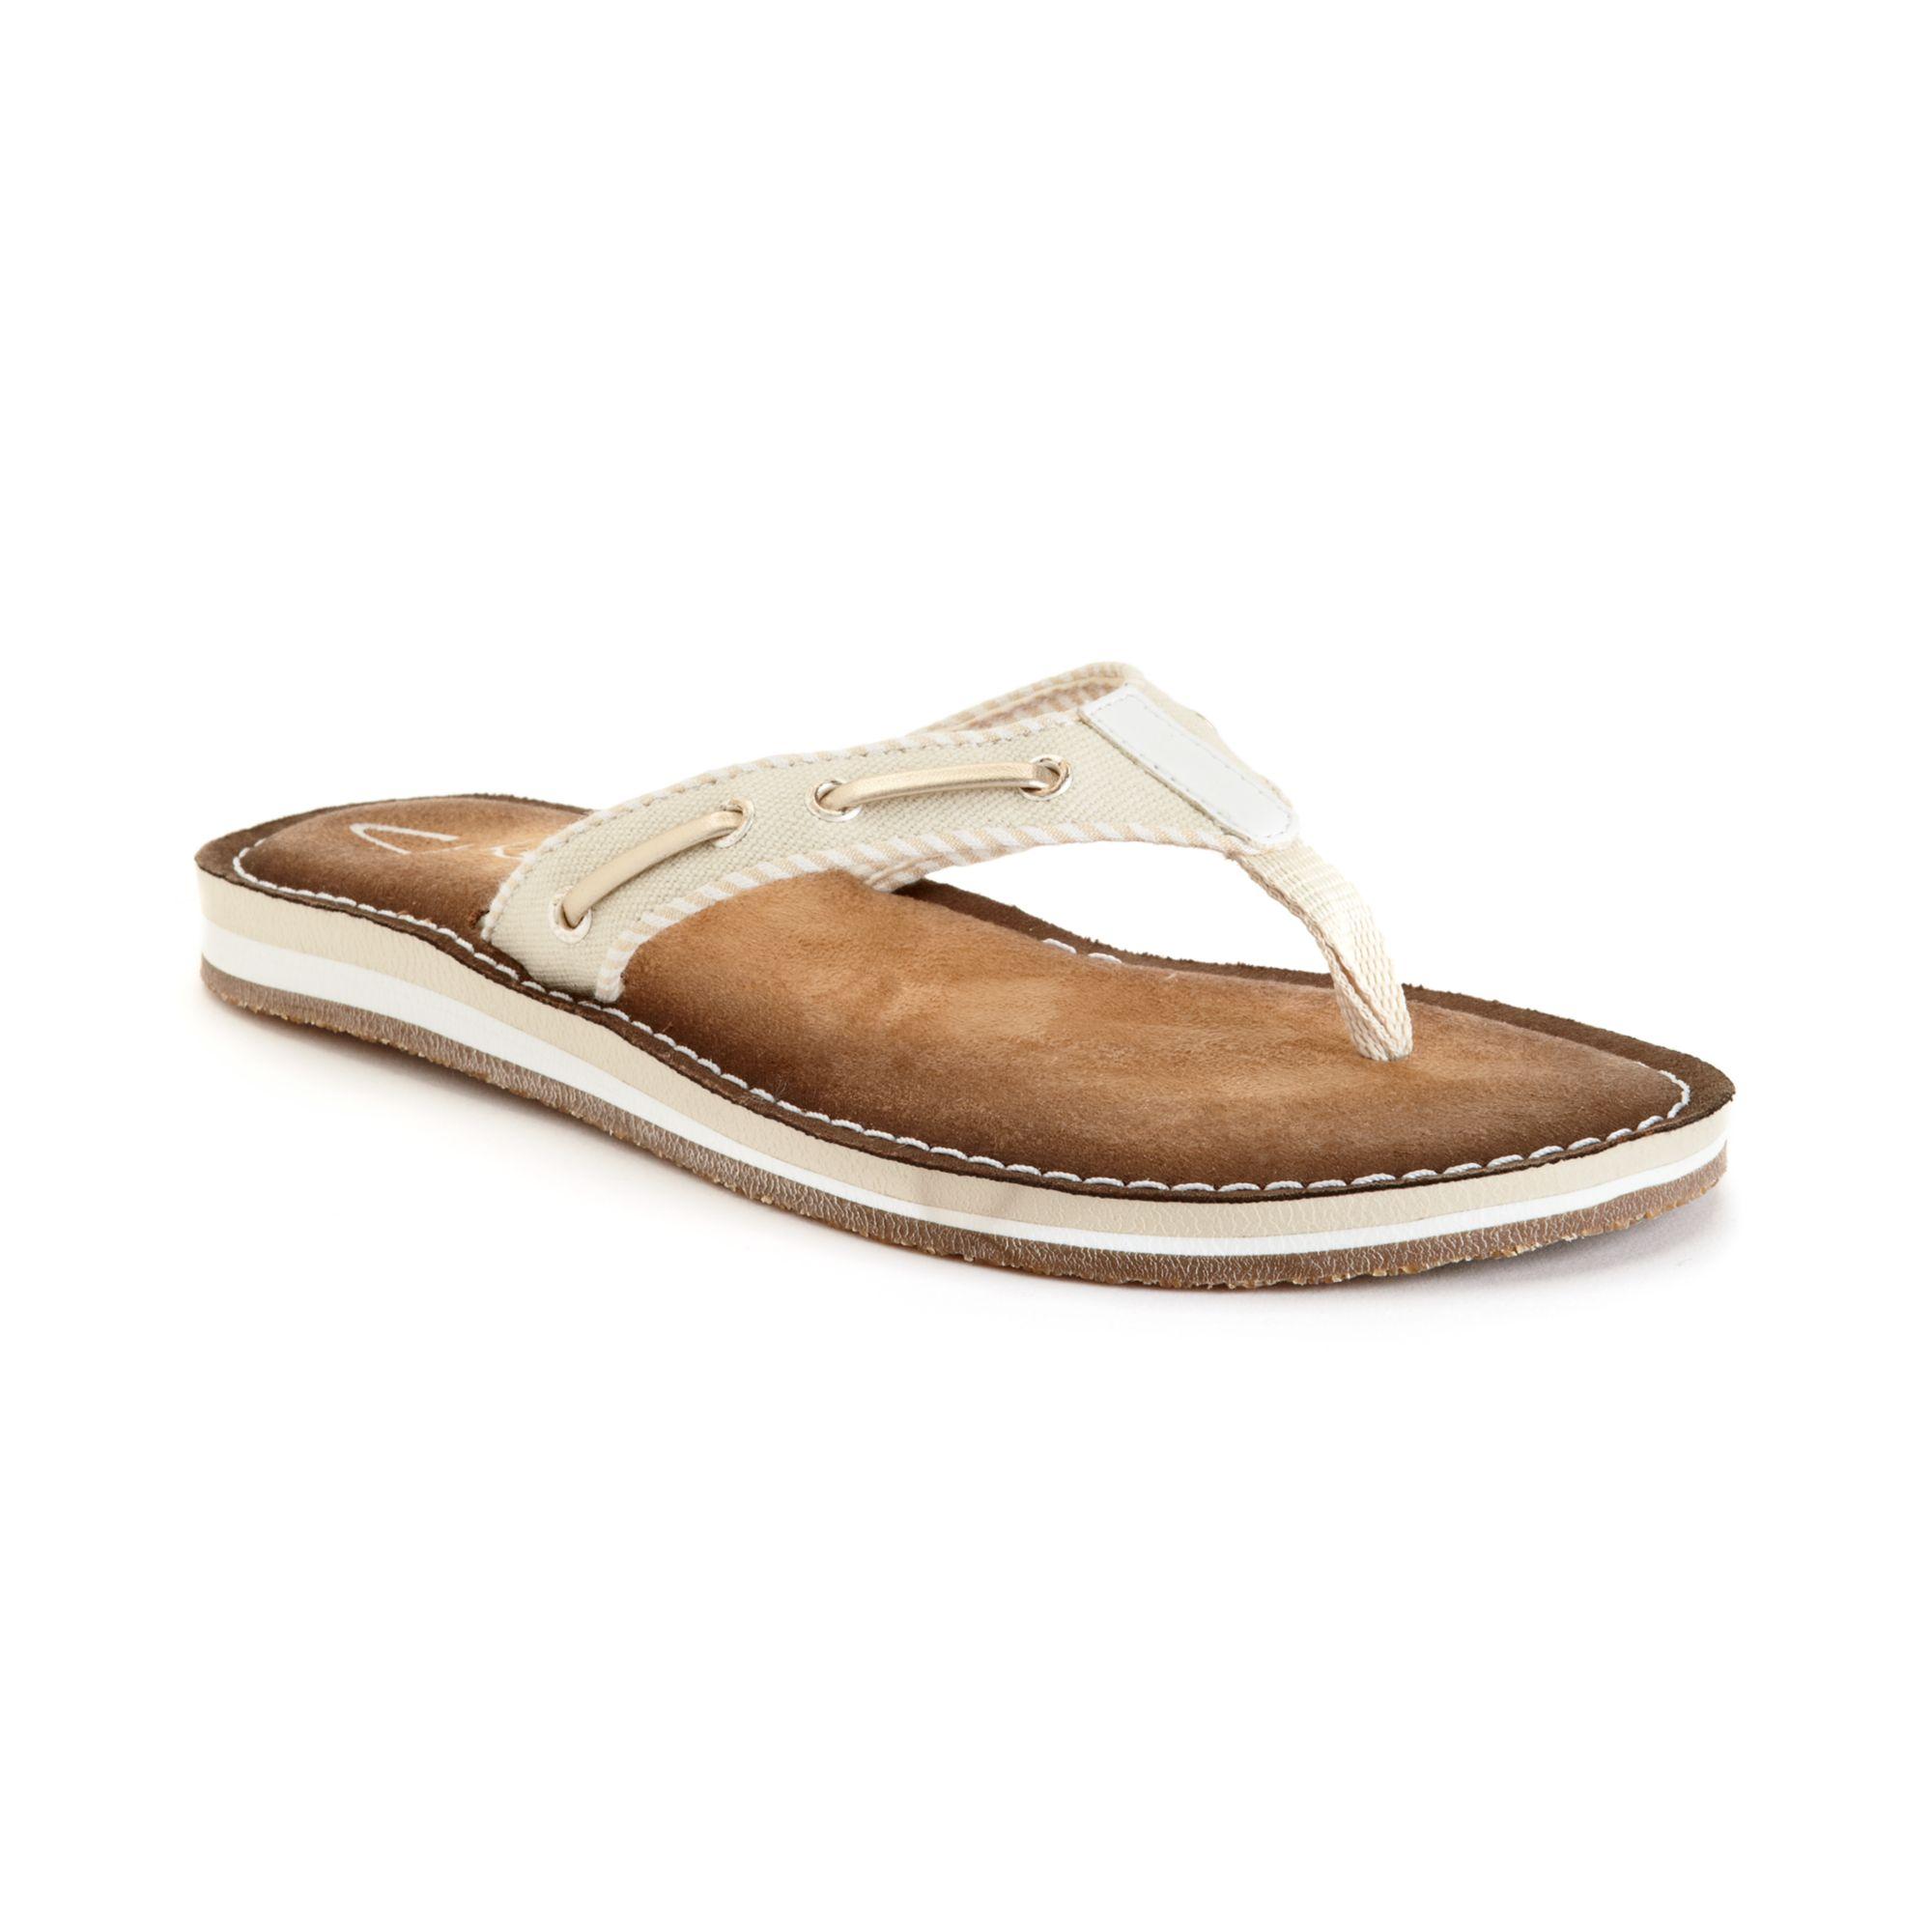 e16b348df7e Clarks Sandals Breeze Mila.Clarks Women s Breeze Sea Sandals 620916 ...